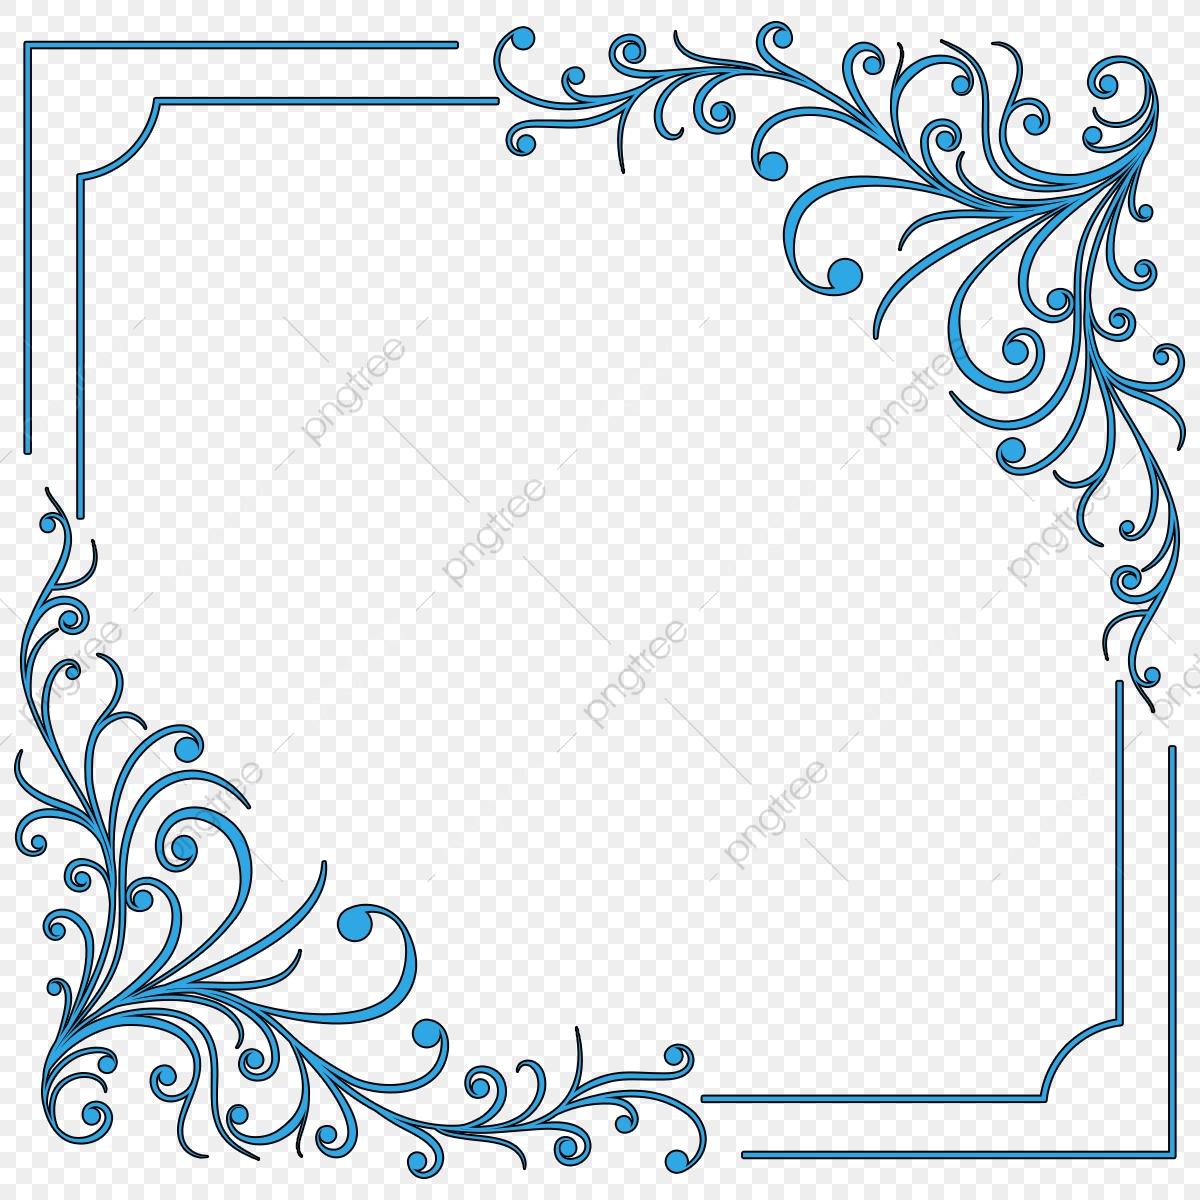 Blue Swirl Border Frame, Loral, Flourish, Floral PNG Transparent.